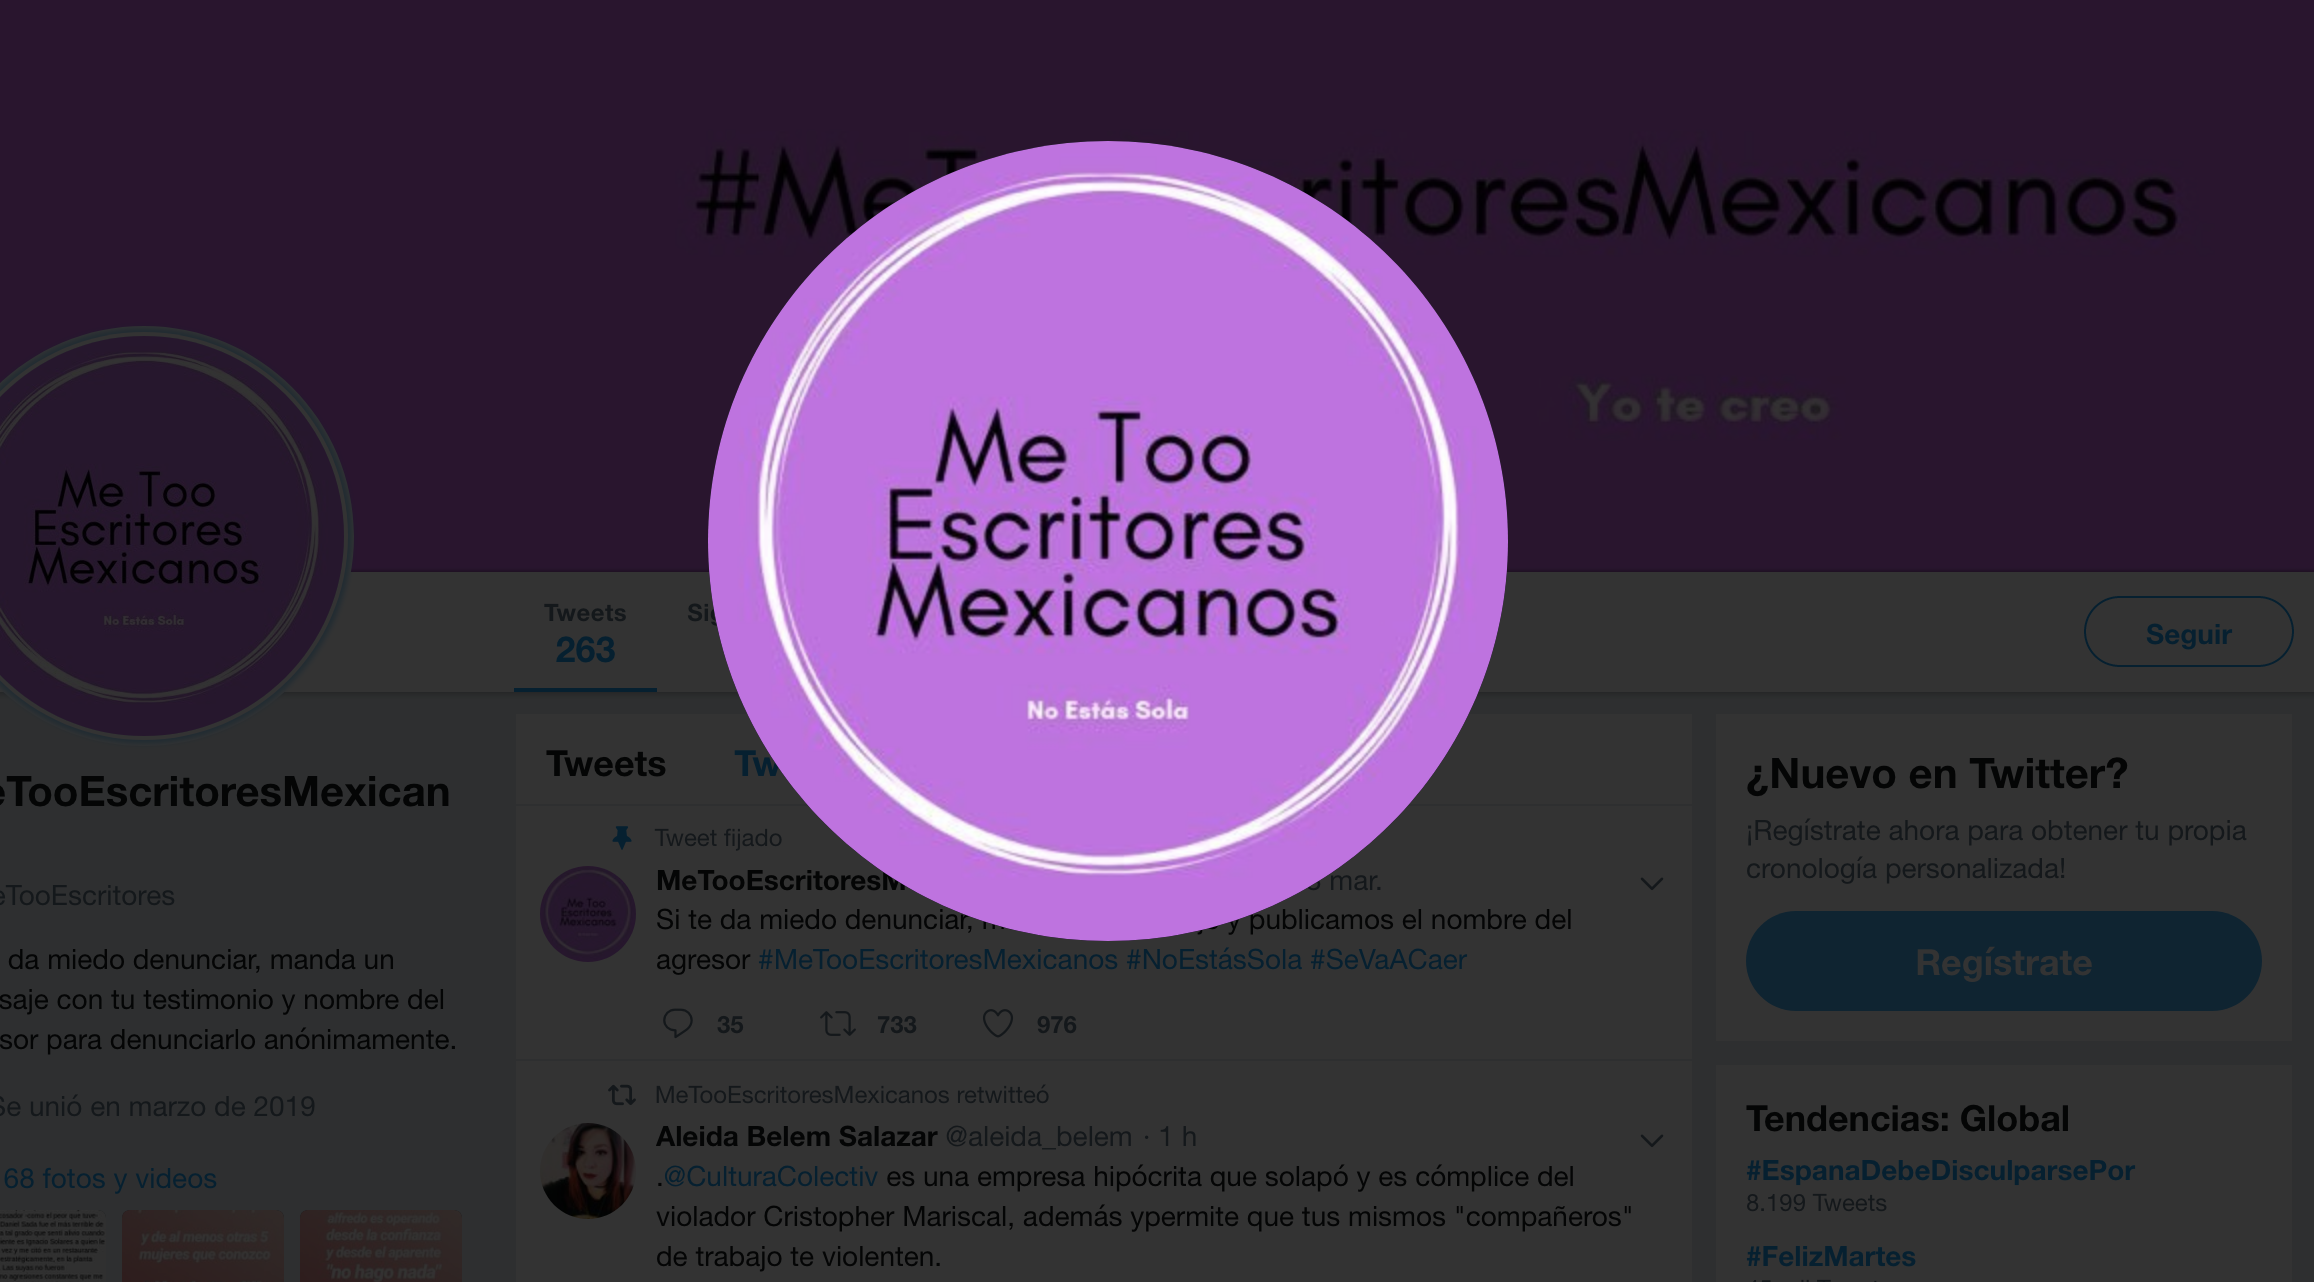 #MeTooEscritoresMexicano